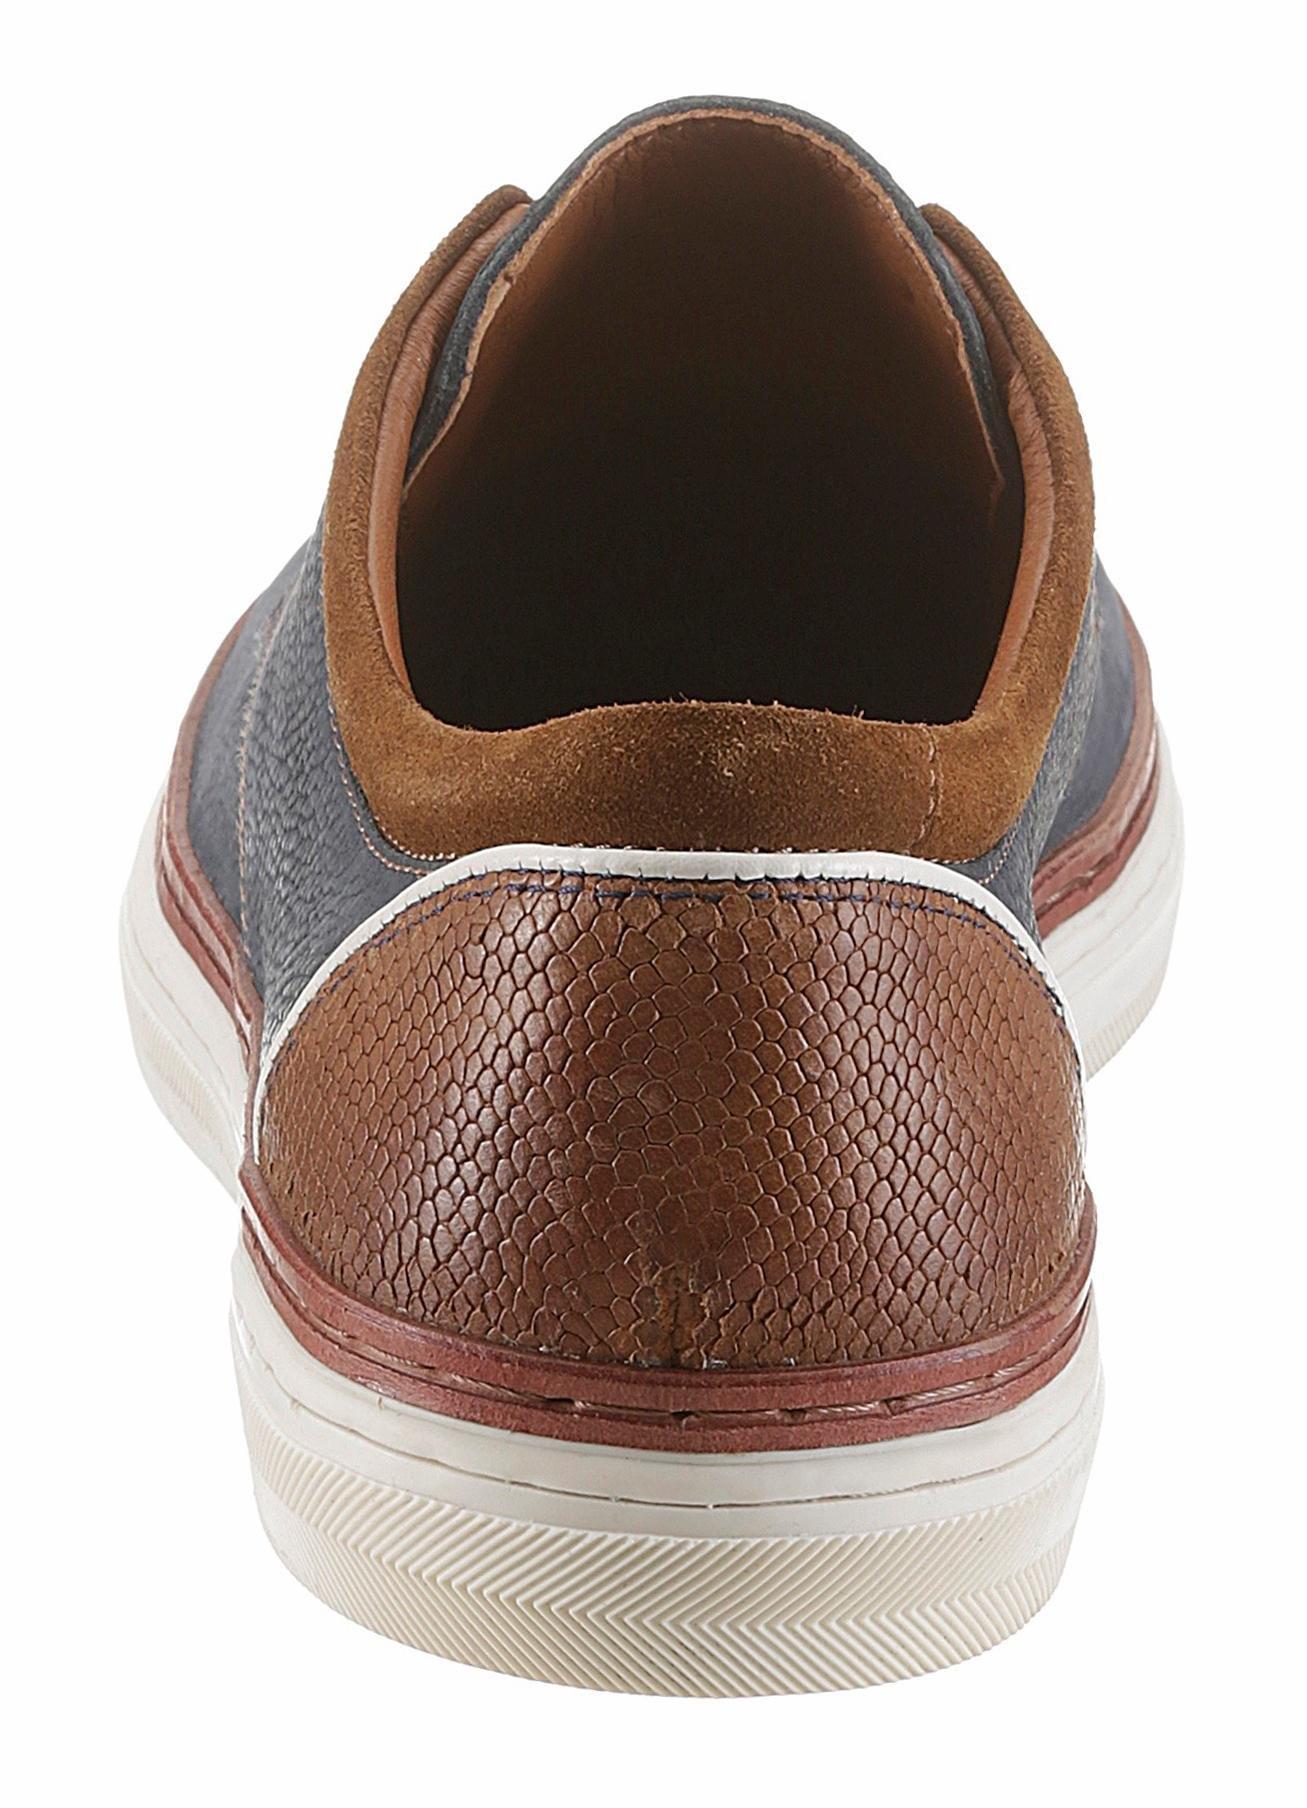 Australian Sneakerstigana Australian Sneakerstigana Kopen Australian Online Kopen Kopen Australian Sneakerstigana Online Online Ib76mfyvYg